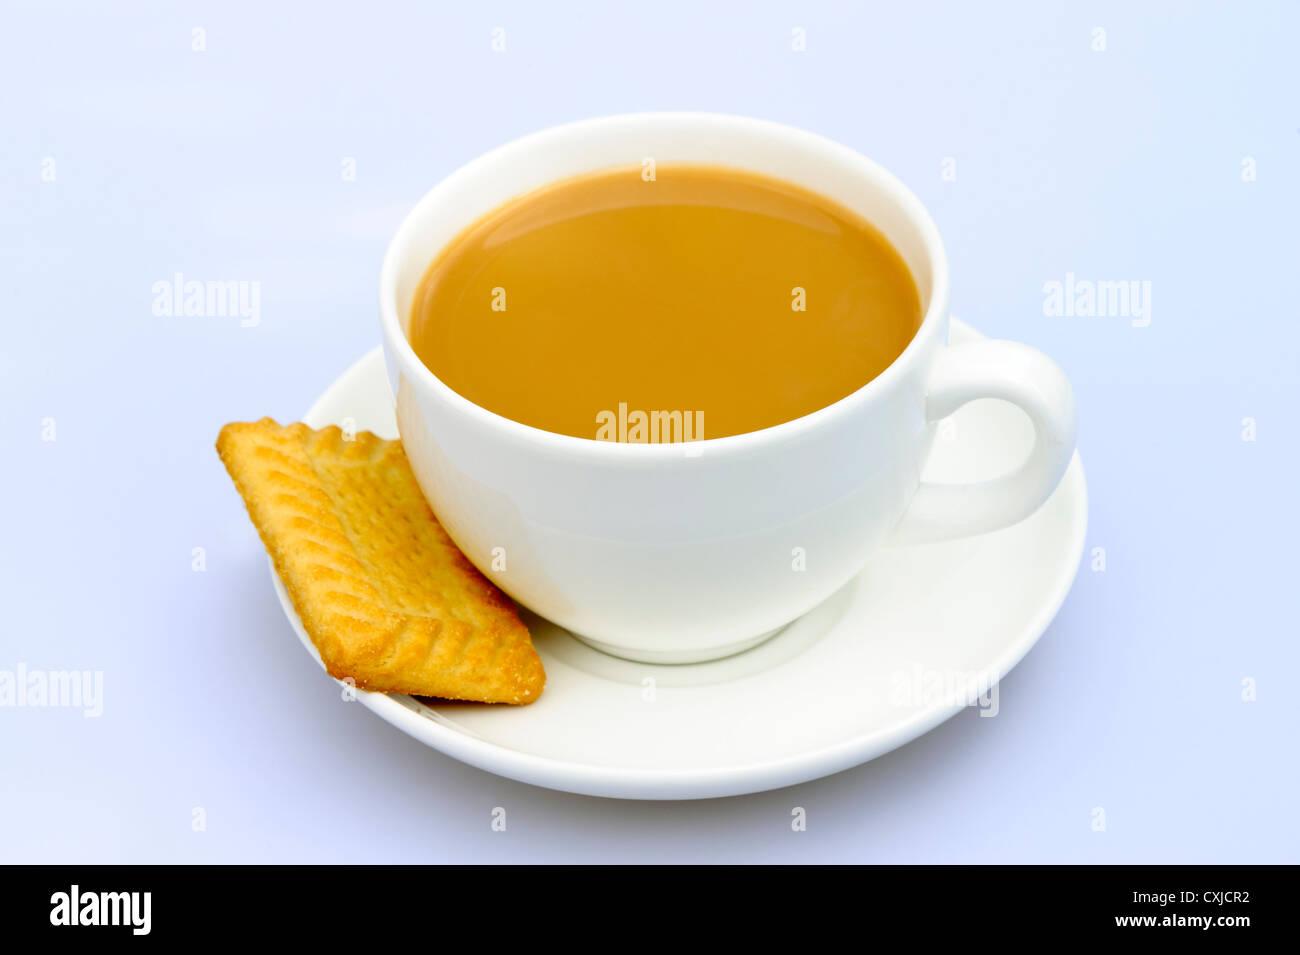 Tazza di tè in una pianura white & coppa piattino. Bollitore per tè e biscotti, UK. Immagini Stock